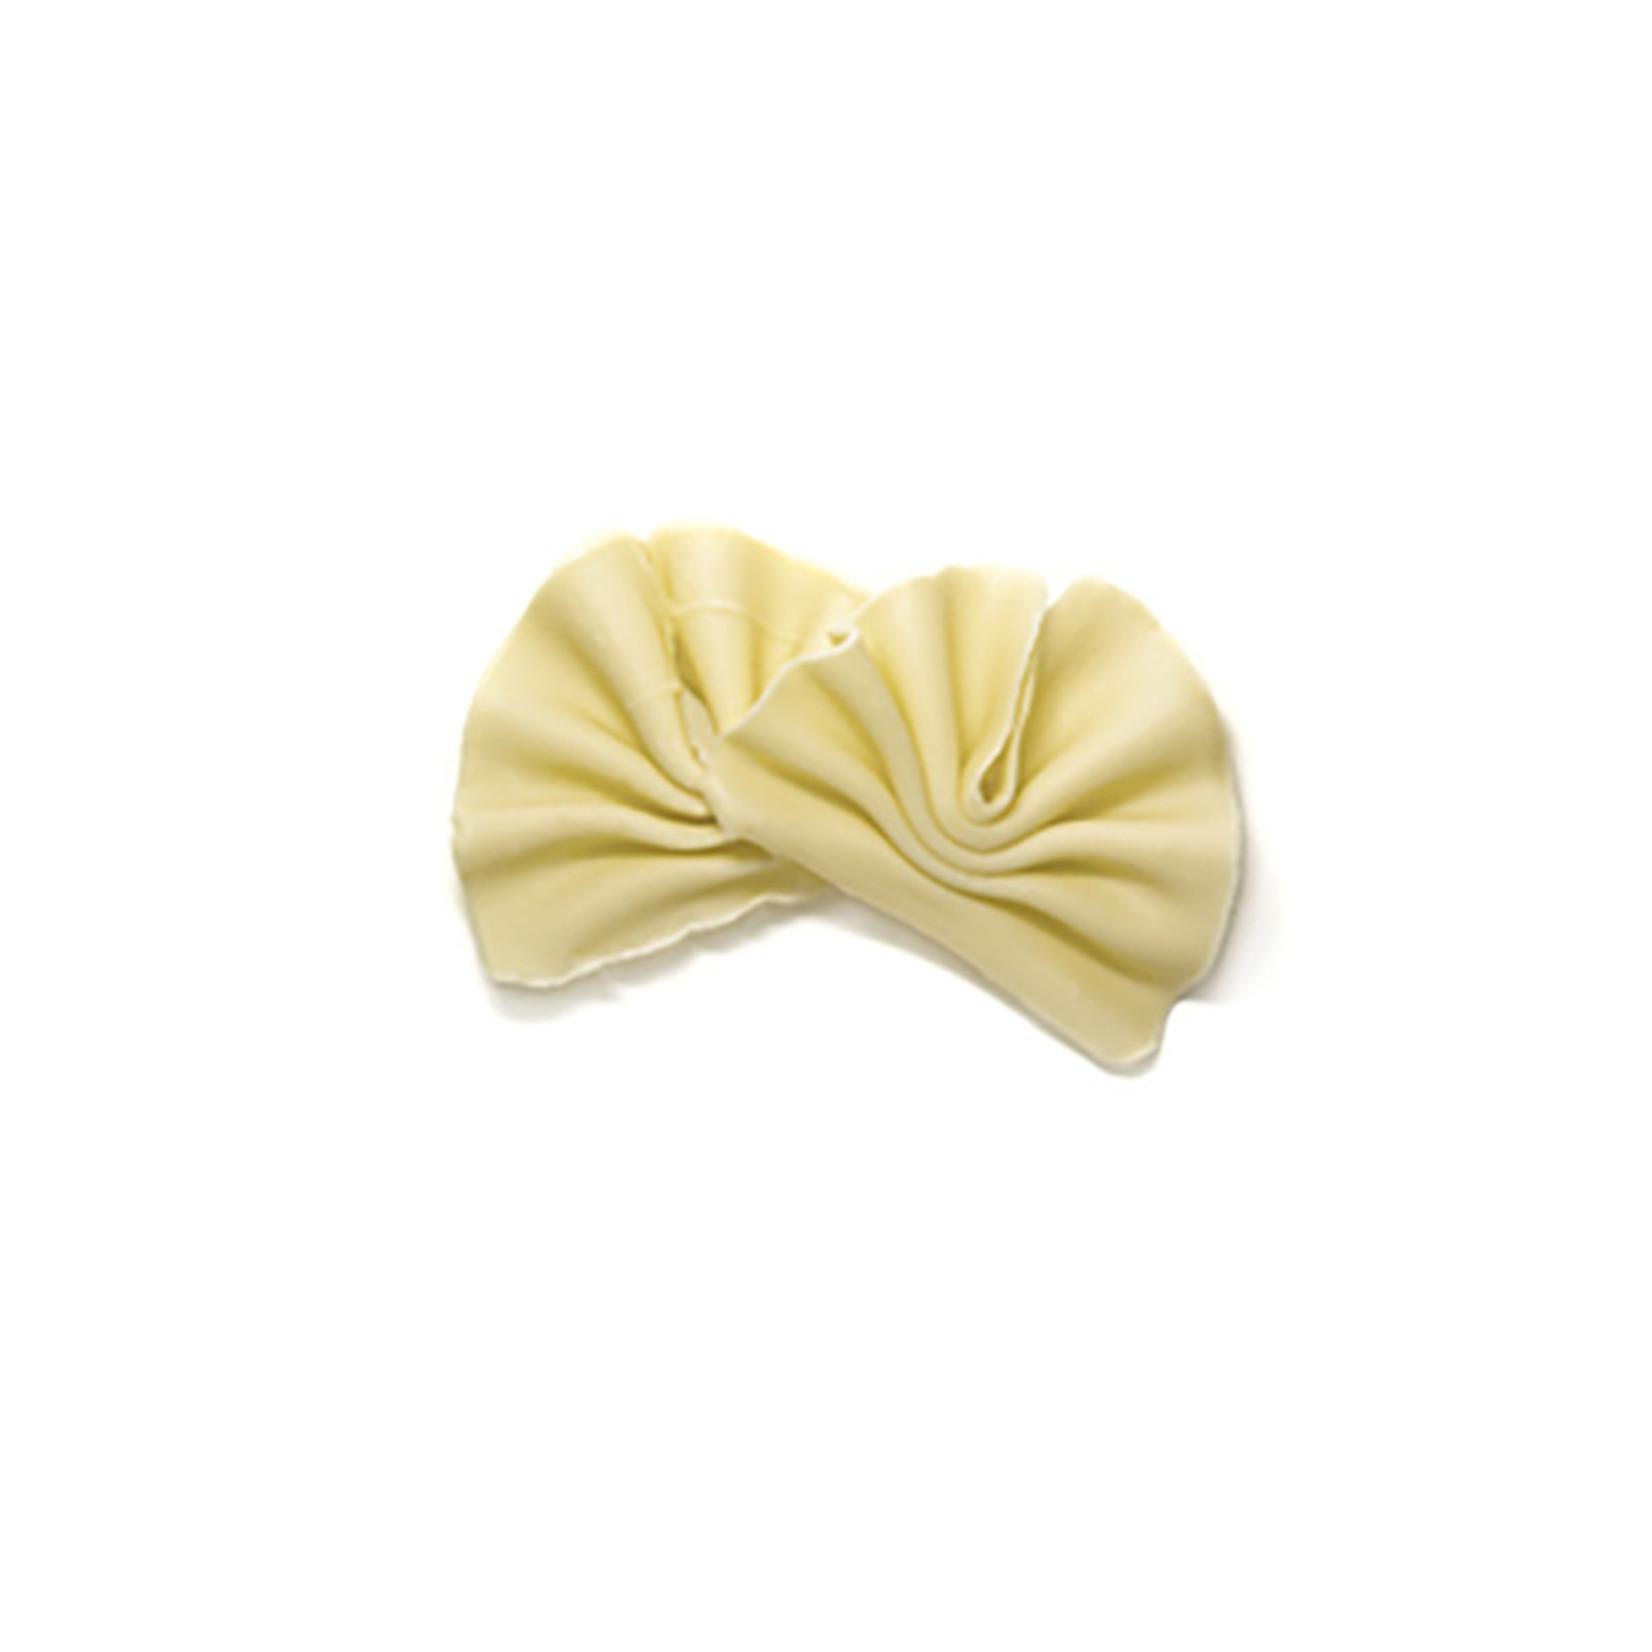 Dobla Dobla - White Chocolate Forest Shavings - 1.3'' (11.9oz), 73192-R